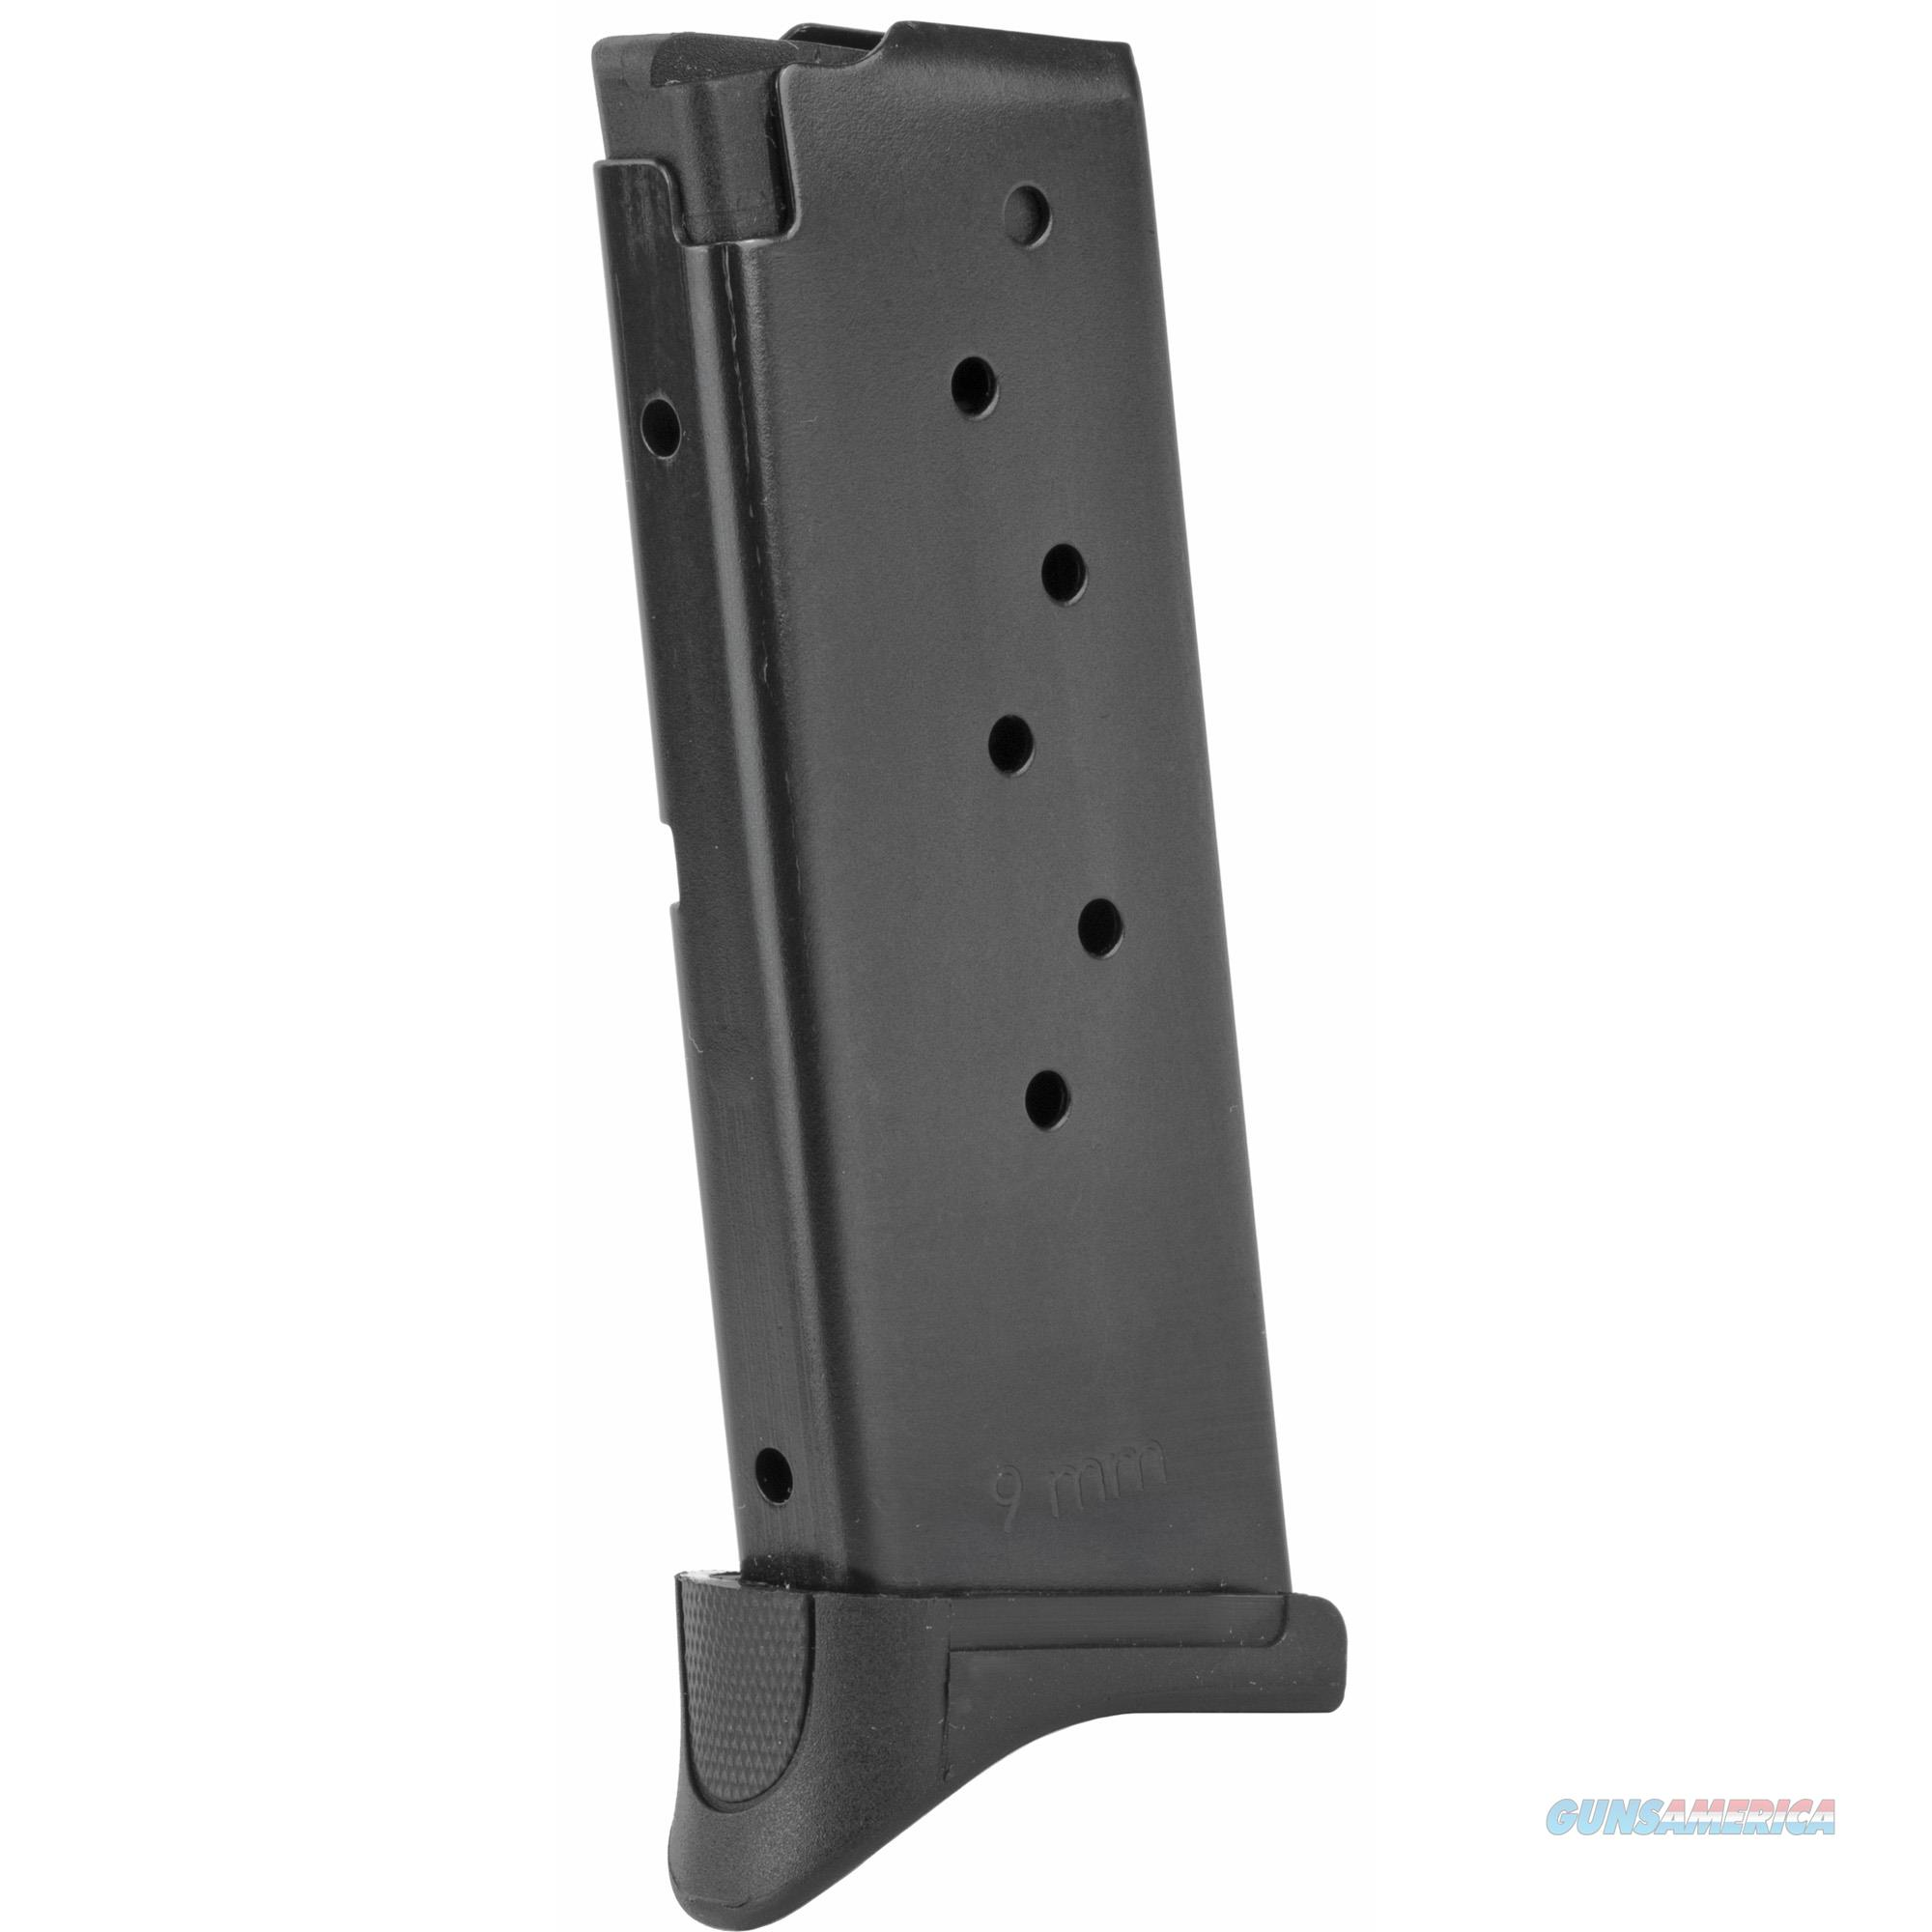 Pro Mag Magazine Ruger Lc9 - 9mm 7-rounds Blued Steel  Guns > Pistols > 1911 Pistol Copies (non-Colt)